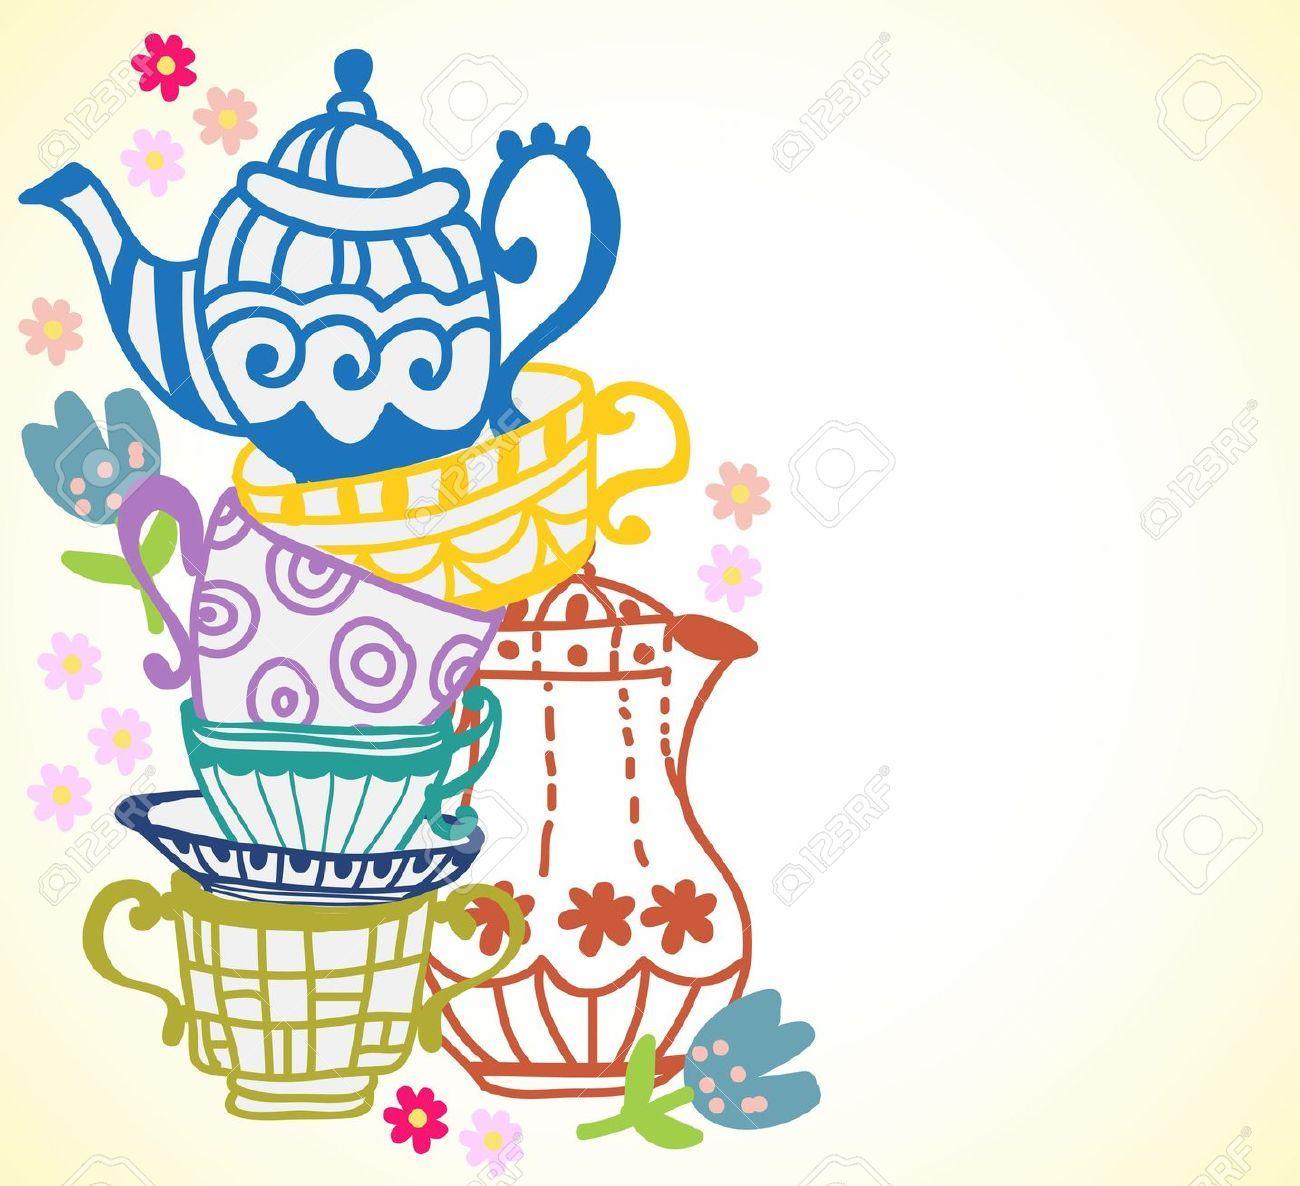 Teacups and teapot border.